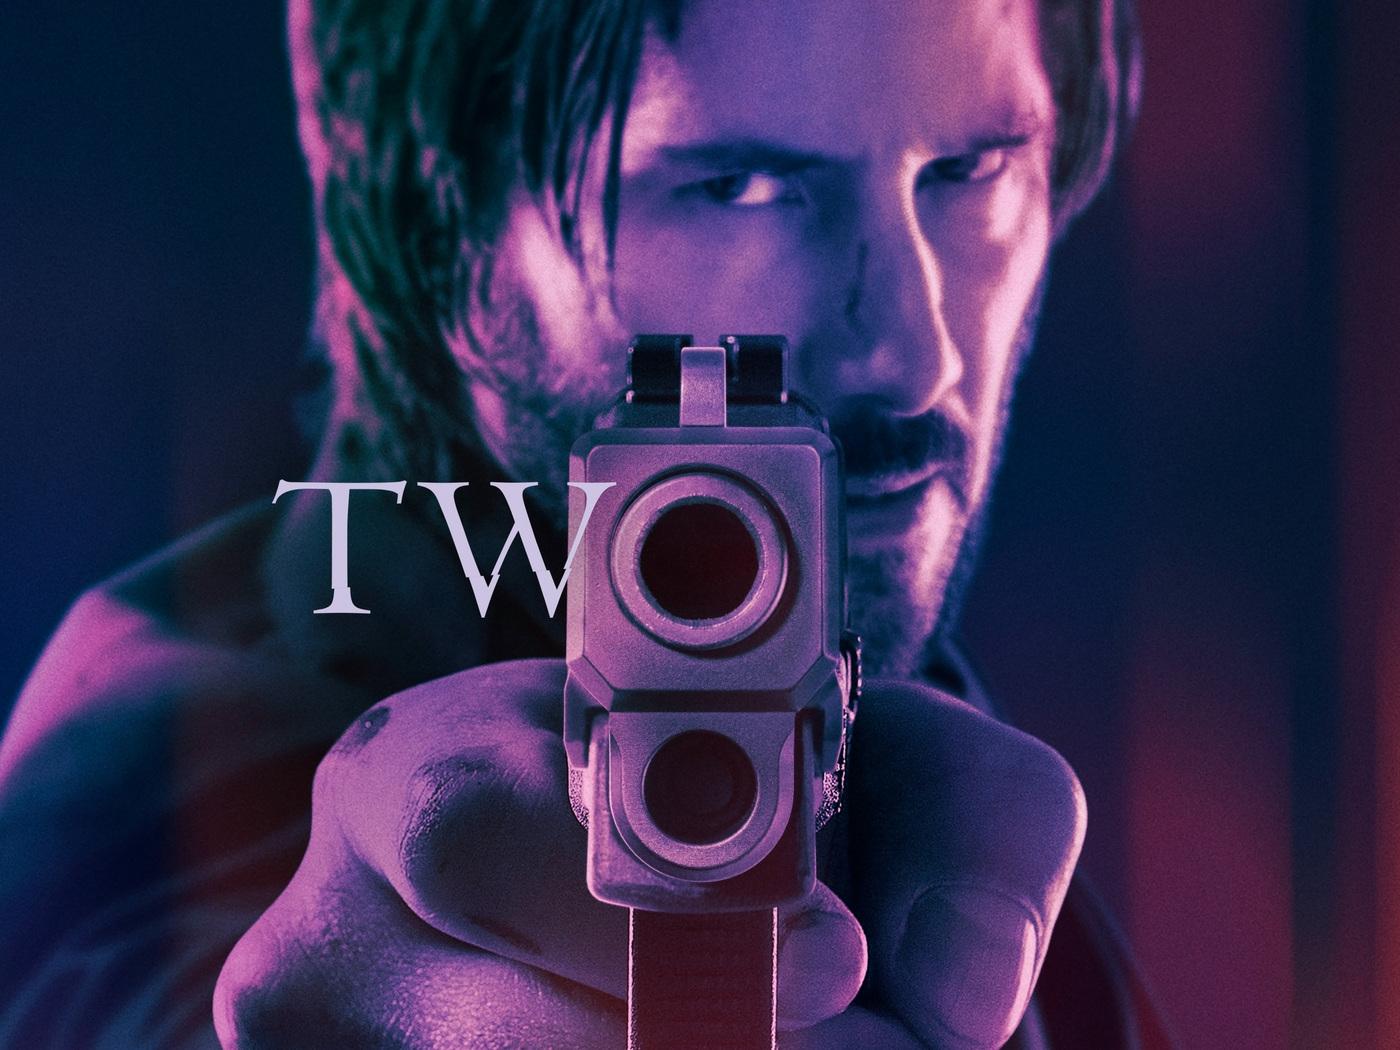 john-wick-chapter-2-2017-movie-5k-img.jpg